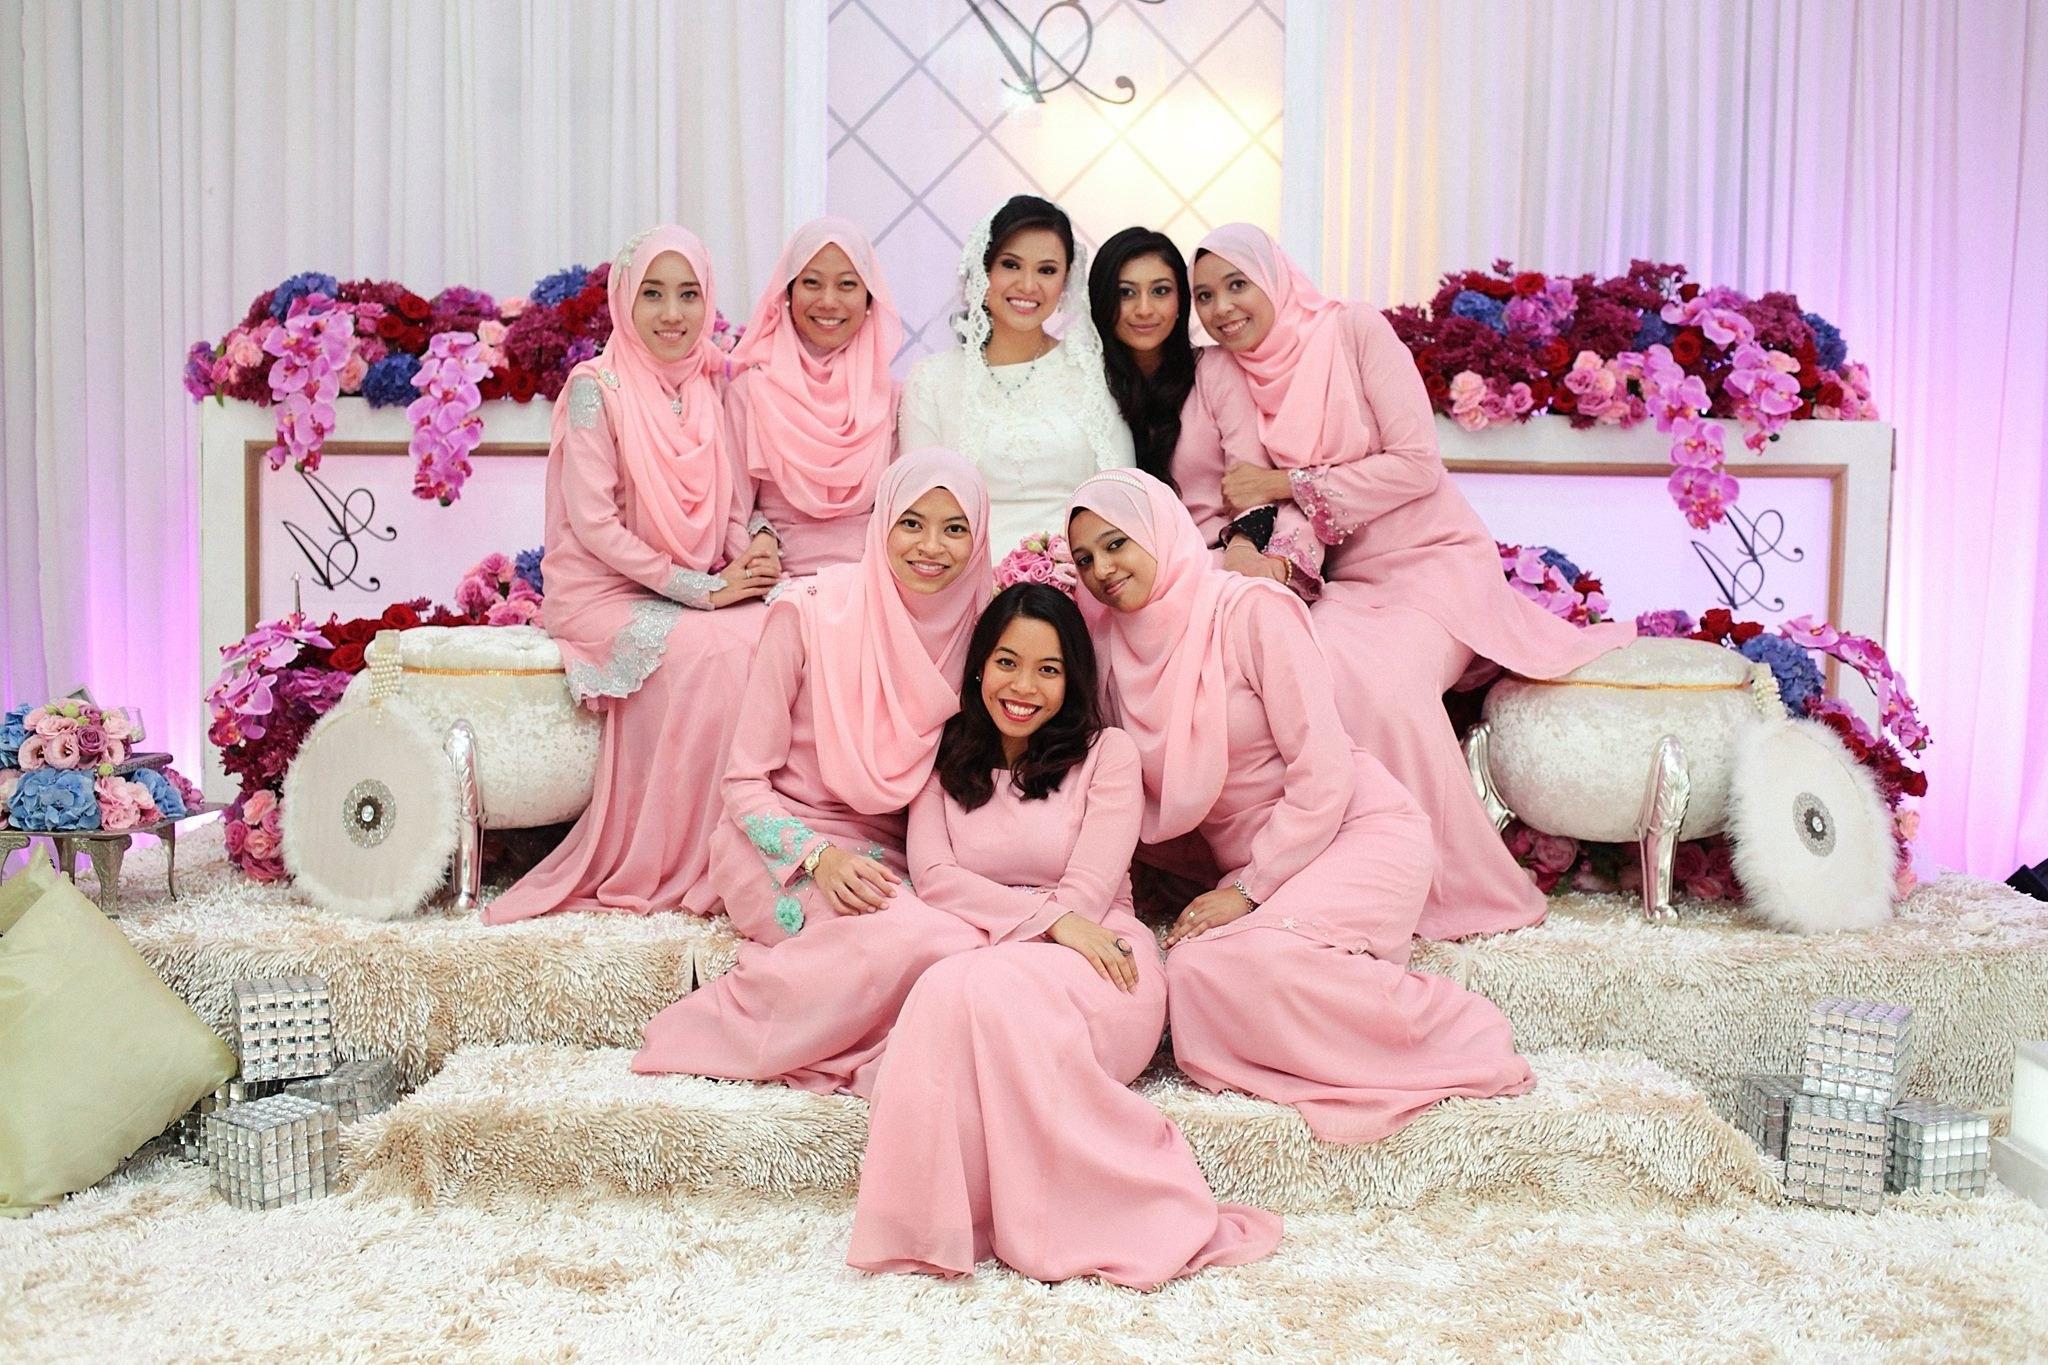 Model Bridesmaid Hijab X8d1 Malay Wedding the Bride & the Bridesmaids In Pastel Pink